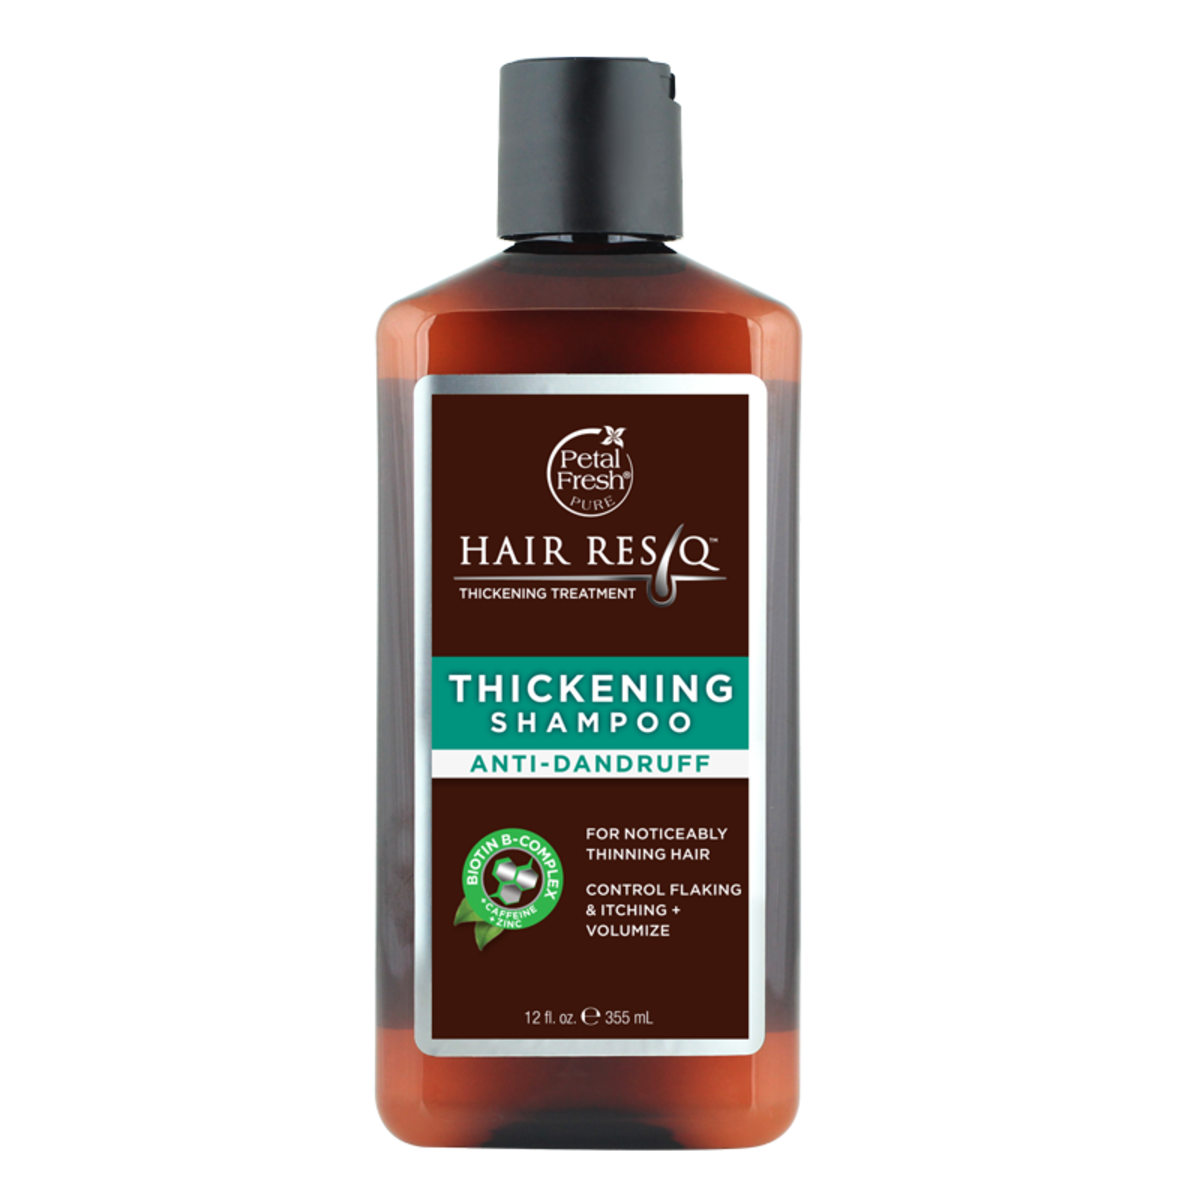 Hair Rescue Anti-Dandruff Shampoo